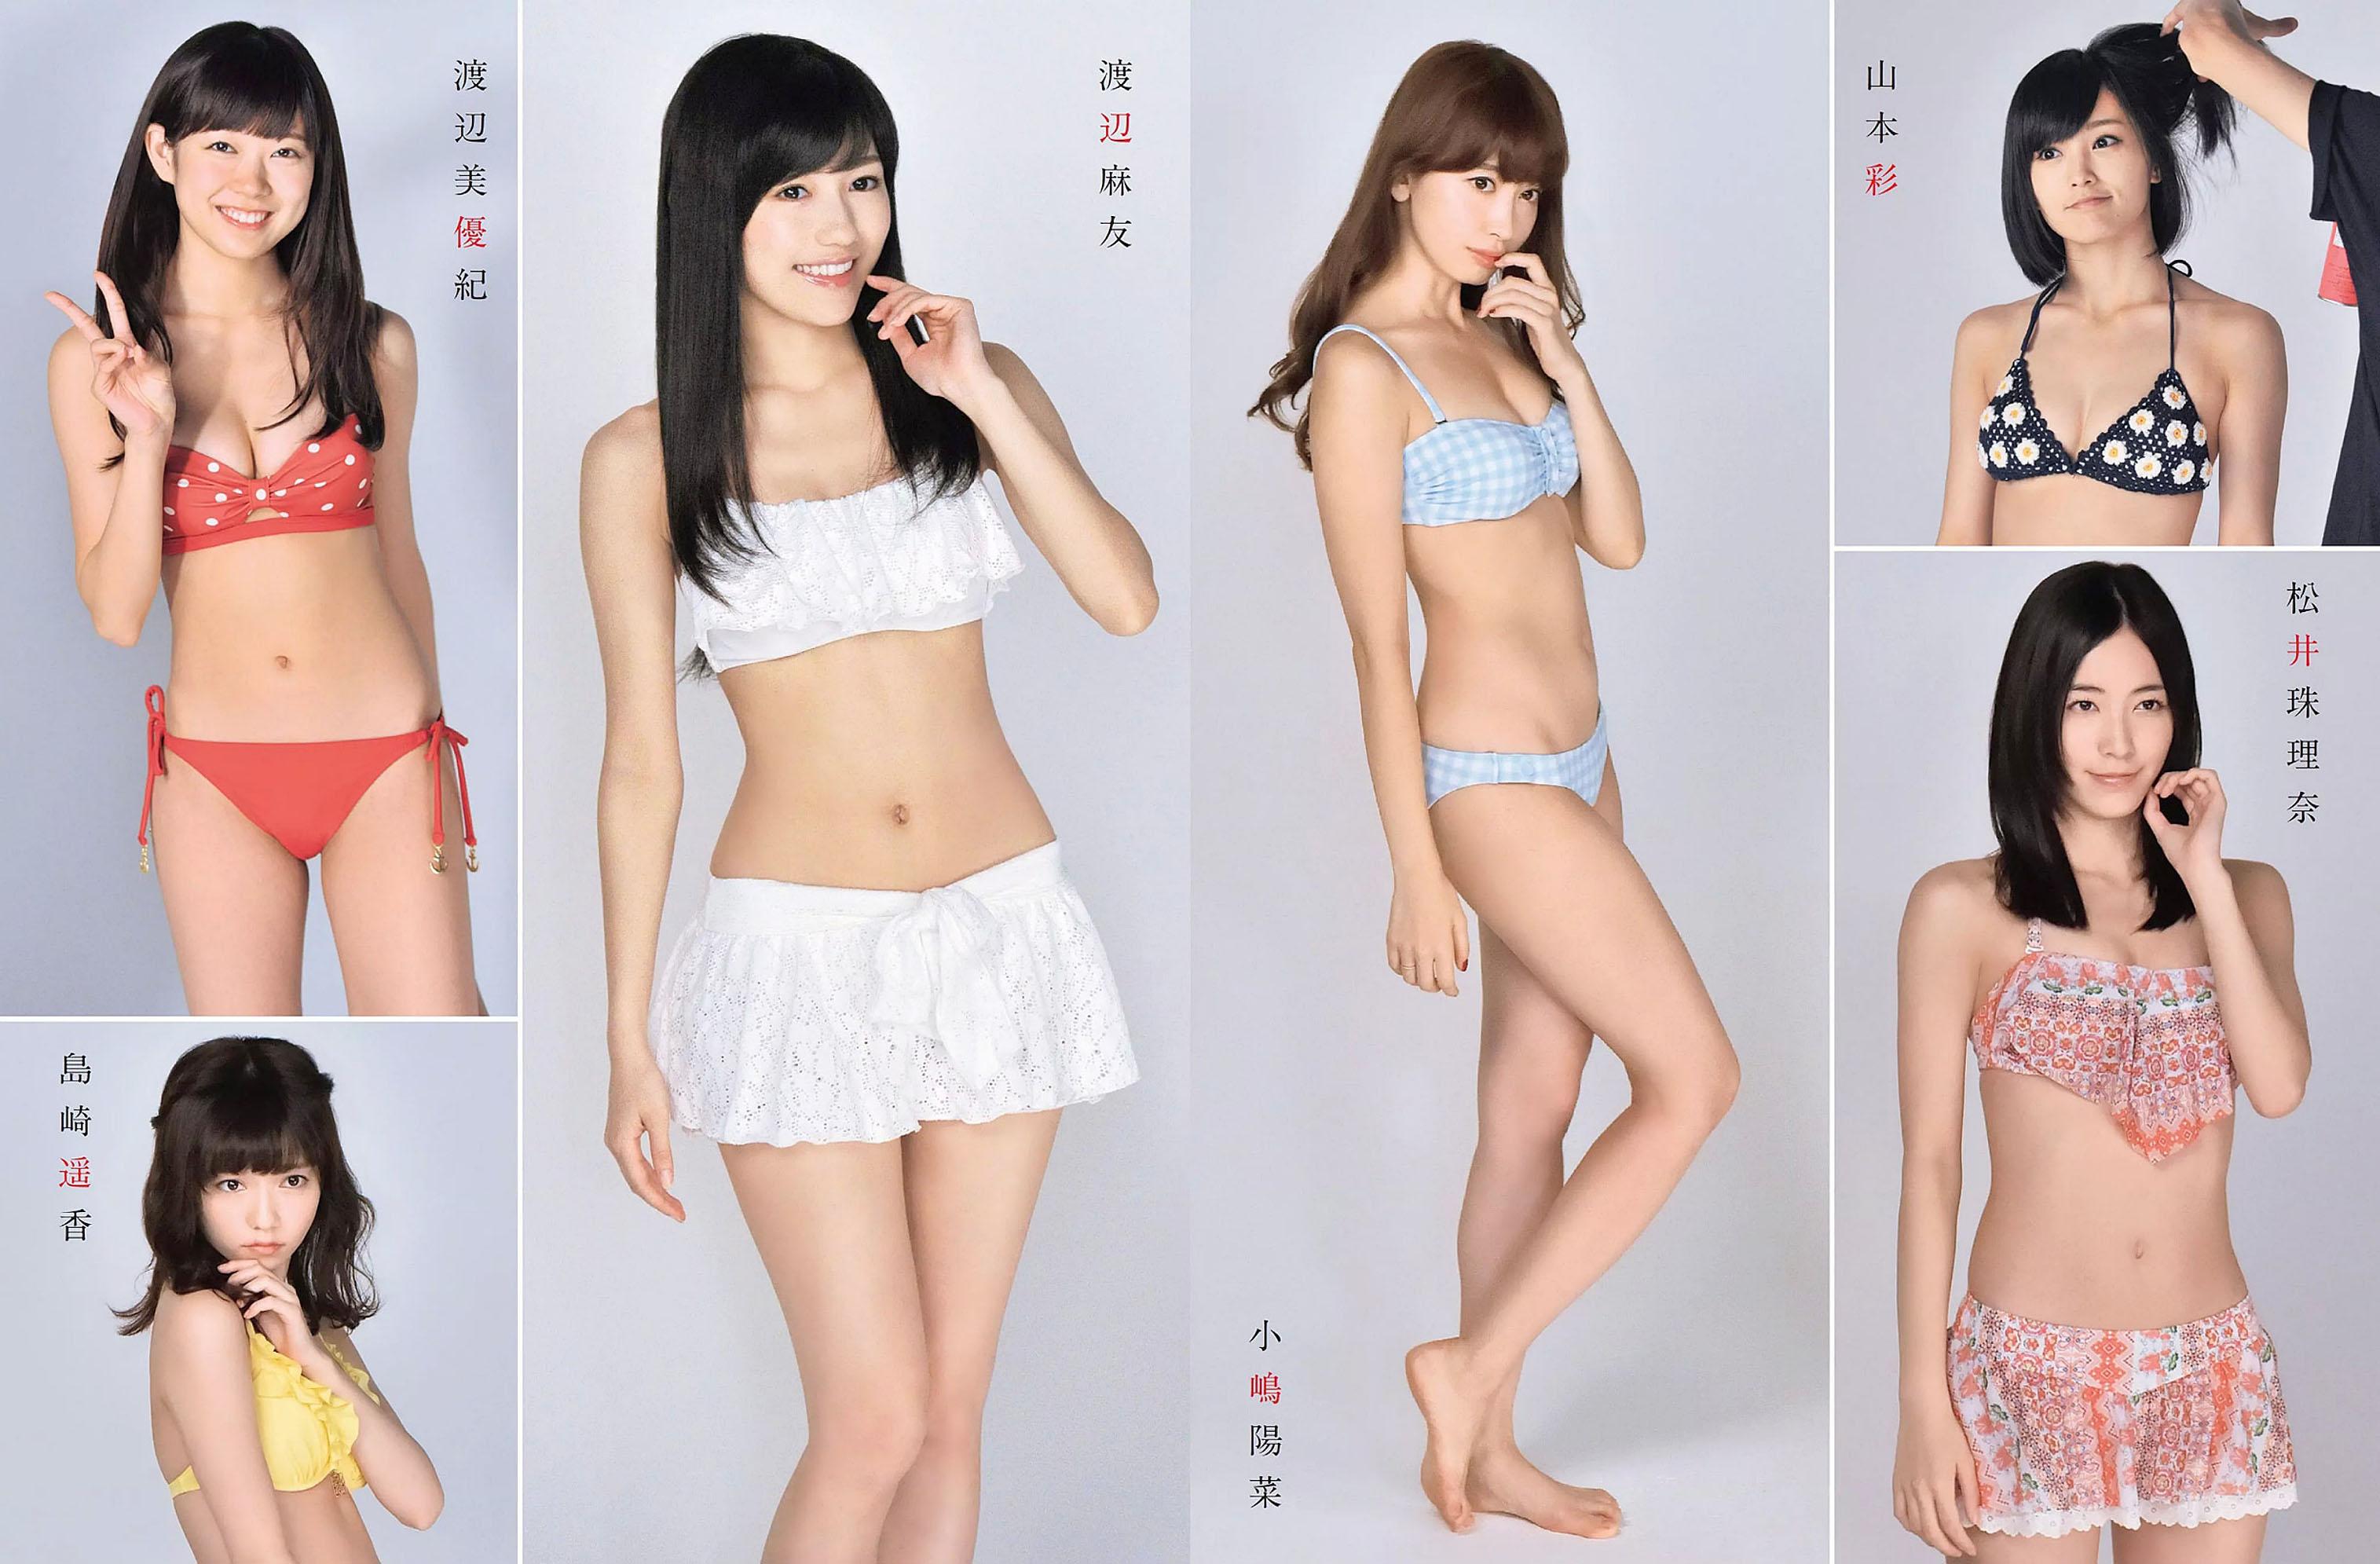 AKB48 Flash 141202 02.jpg